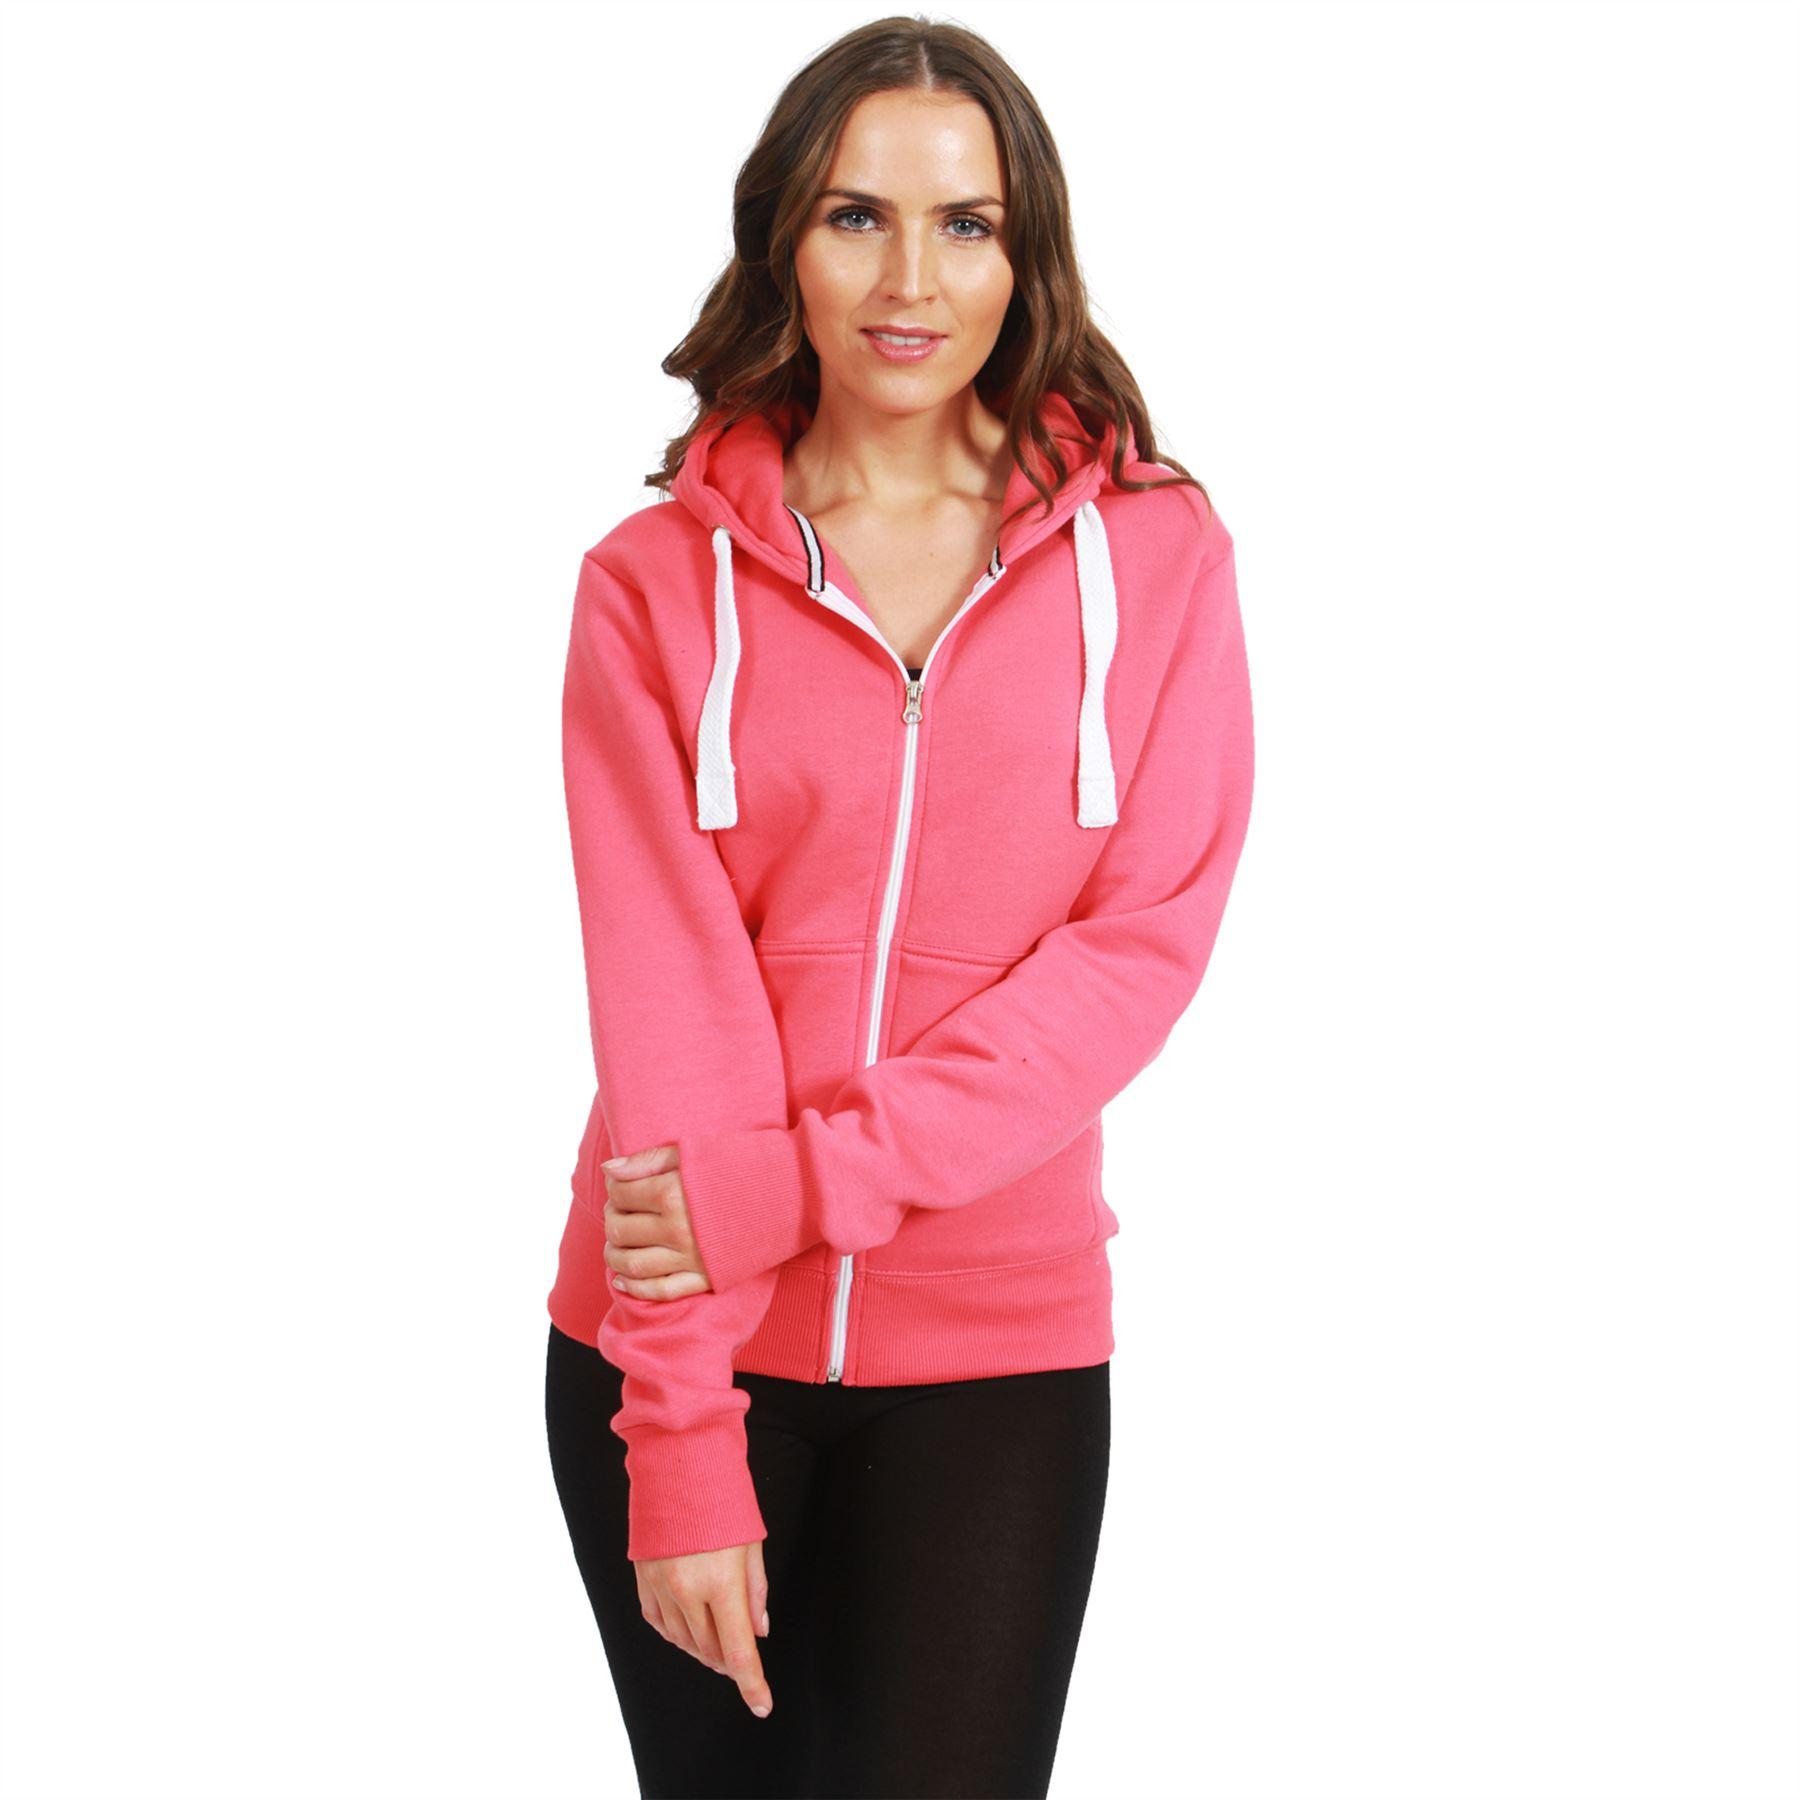 Zipper hoodies for women